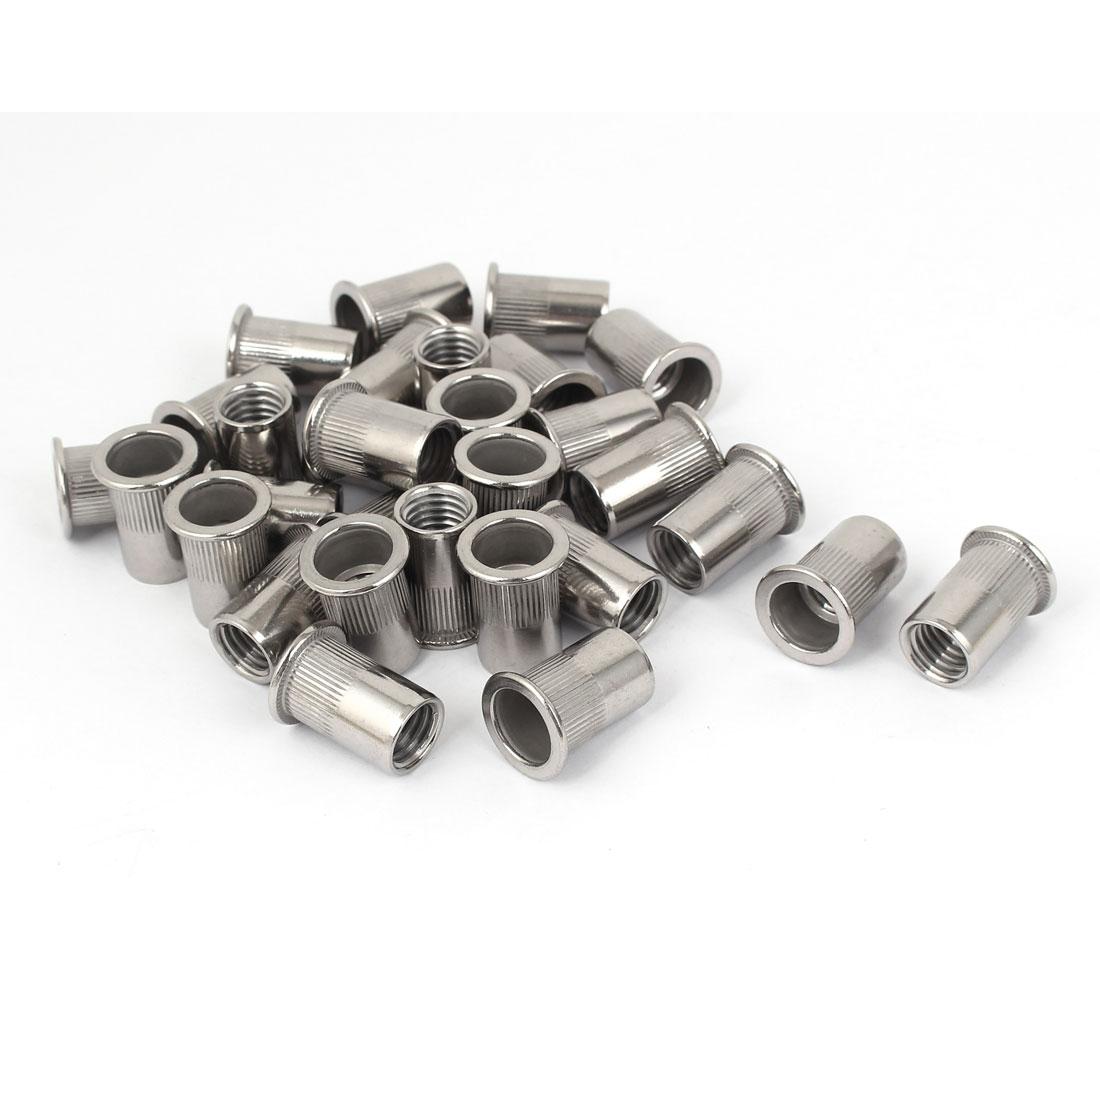 M12 Stainless Steel Flat Head Rivet Nut Insert Nutsert Silver Tone 30pcs